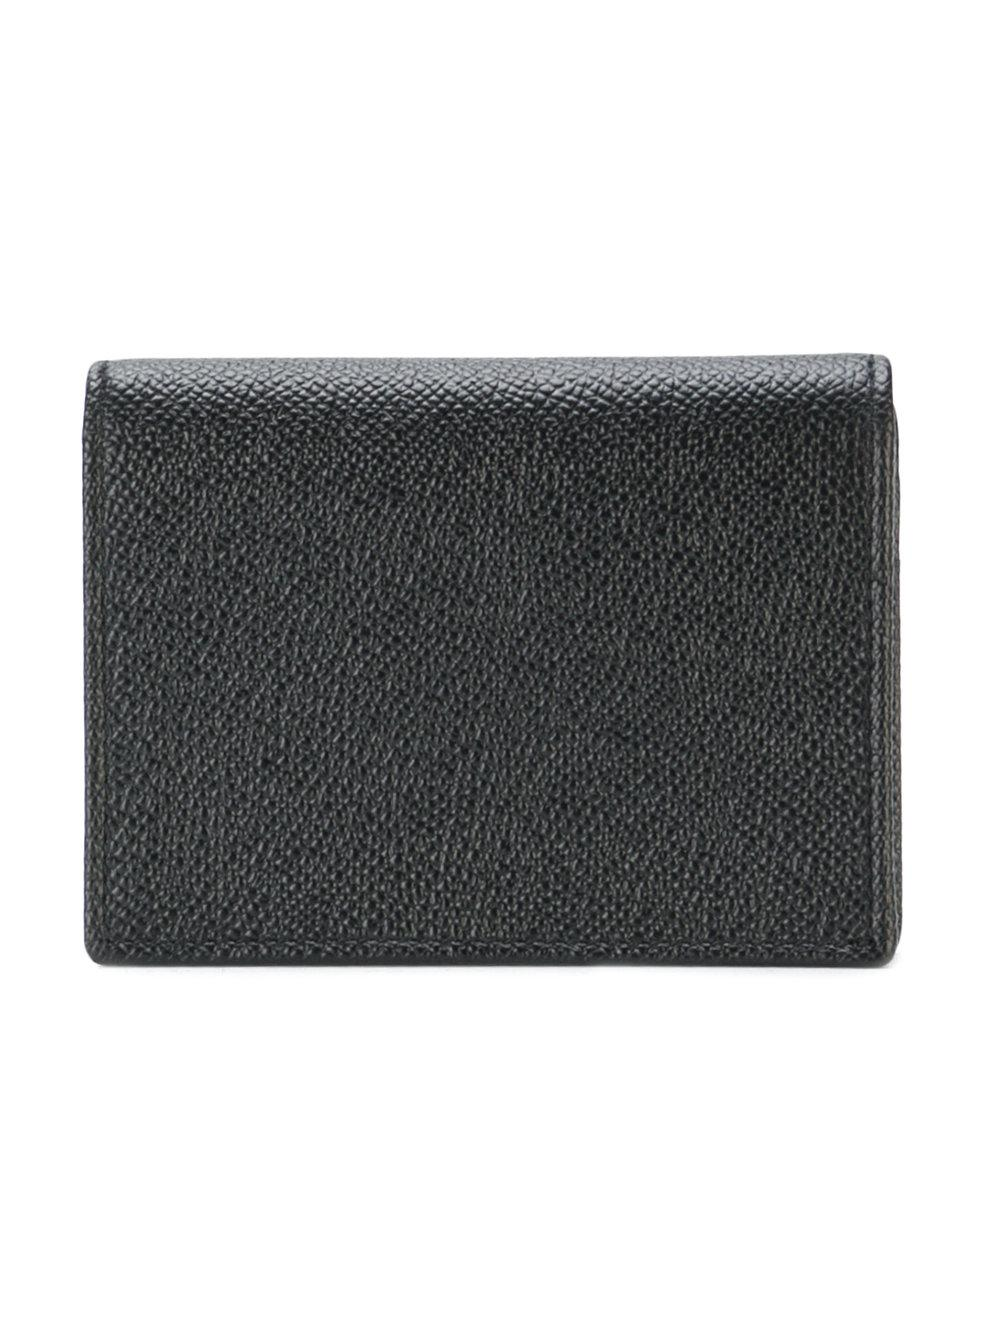 24ac9881dc Lyst - Dolce & Gabbana Logo Foldover Wallet in Black for Men